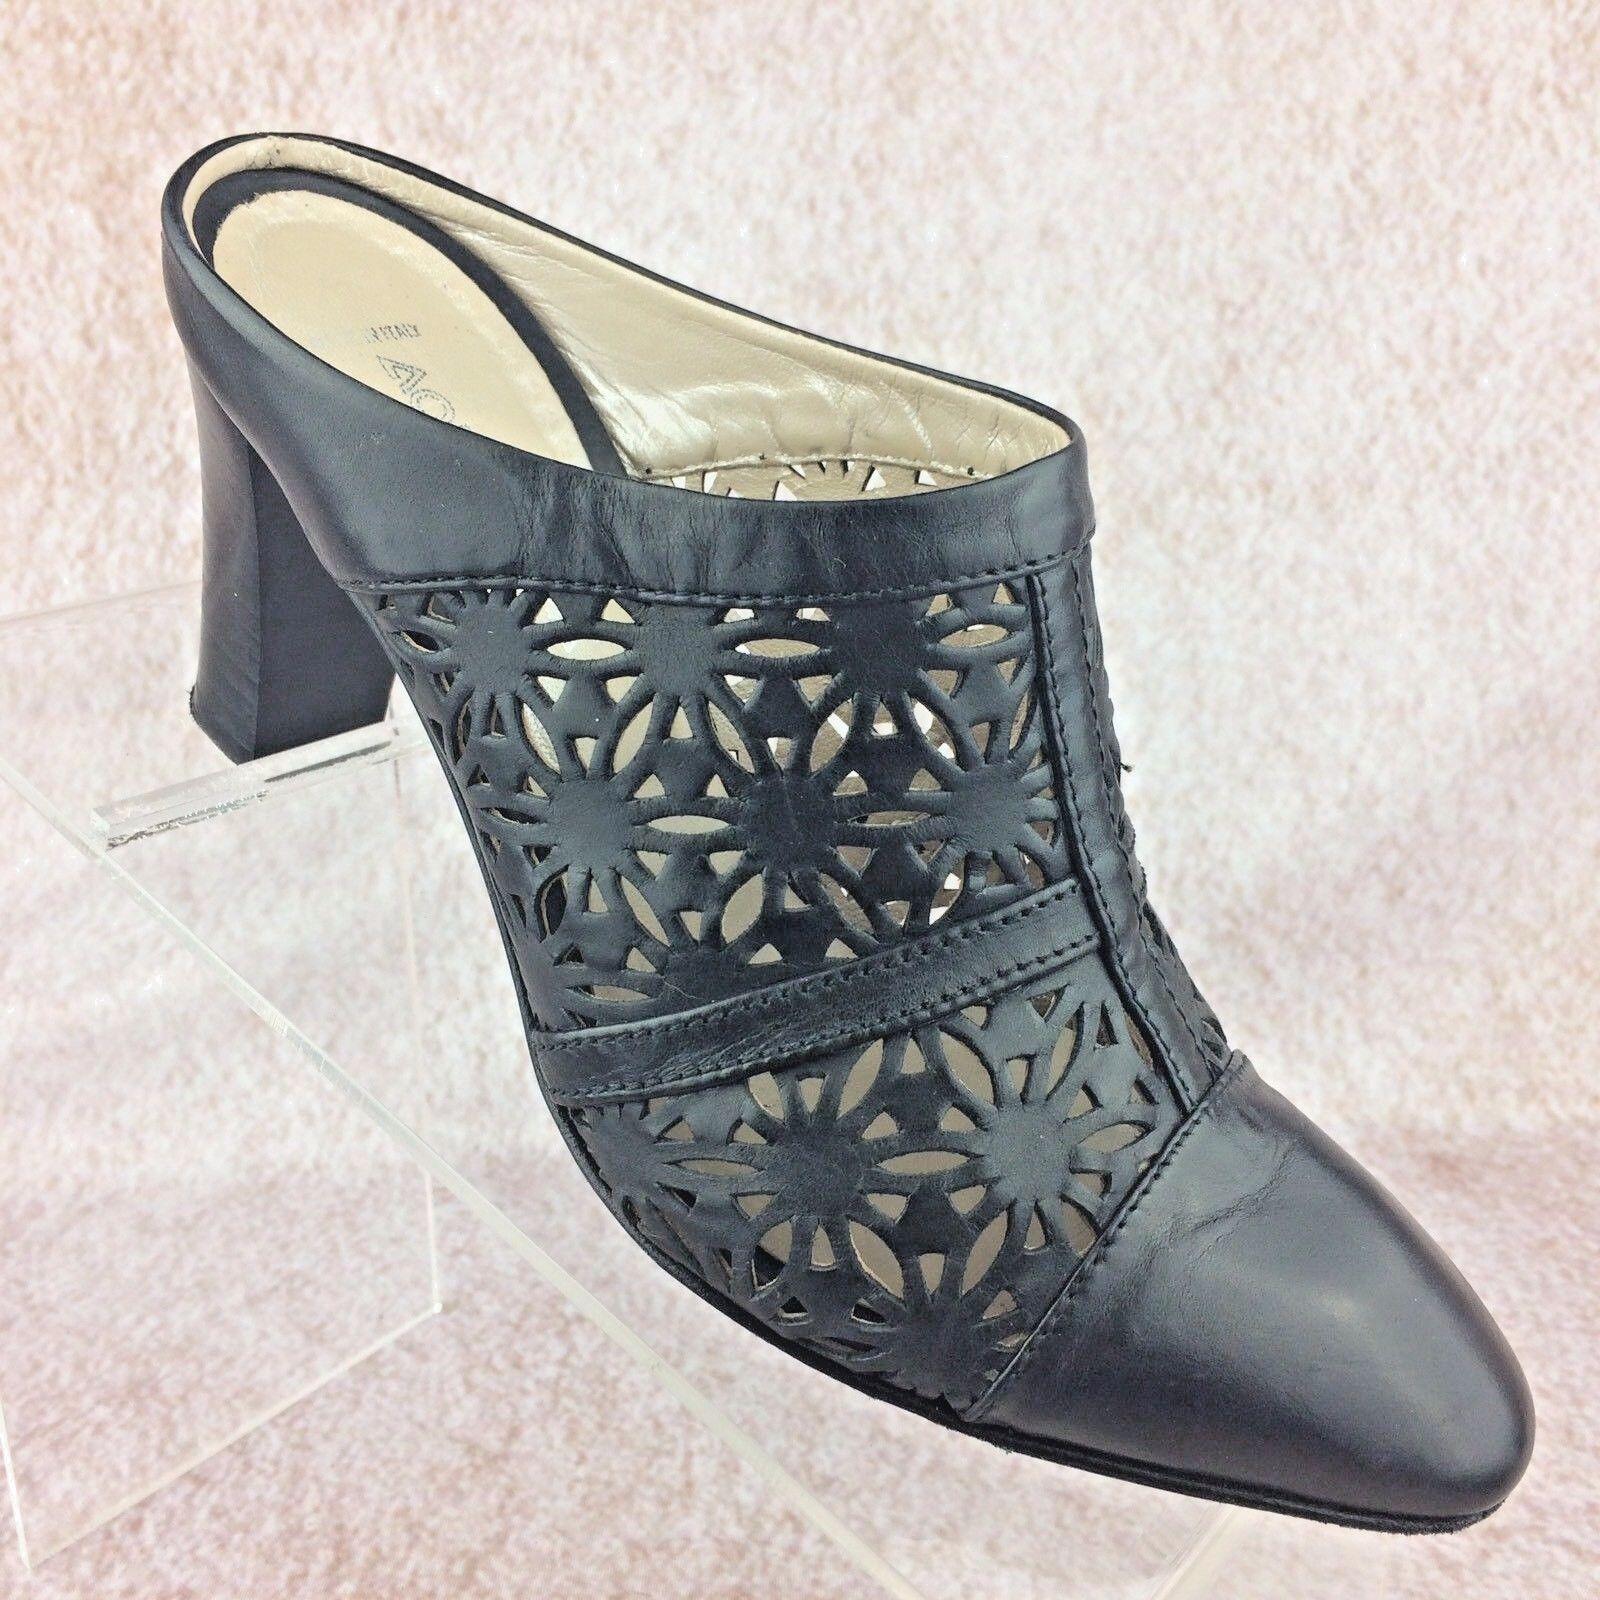 Aquatalia Laser Cut Out Mules Clogs shoes Heels Black Leather - Italian - Sz 6